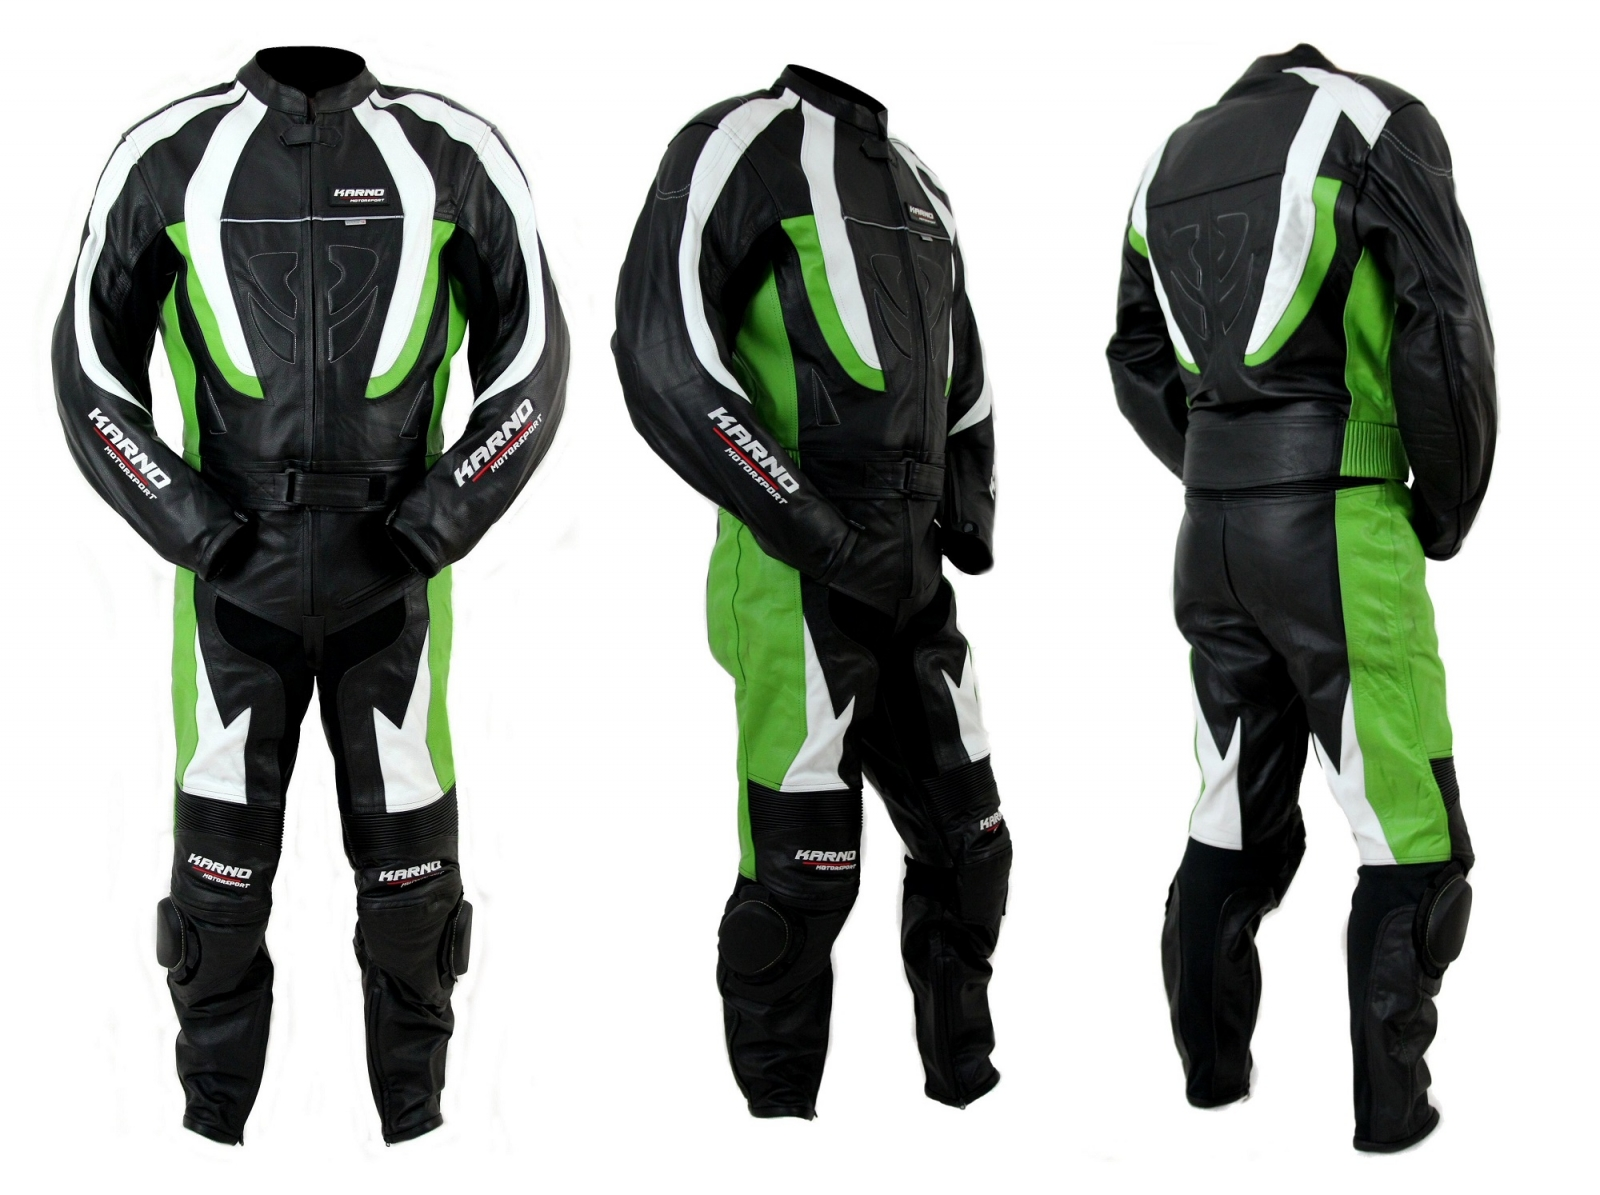 kc200 combinaison moto karno cuir vert green storm race 2 parties vetement moto homme. Black Bedroom Furniture Sets. Home Design Ideas